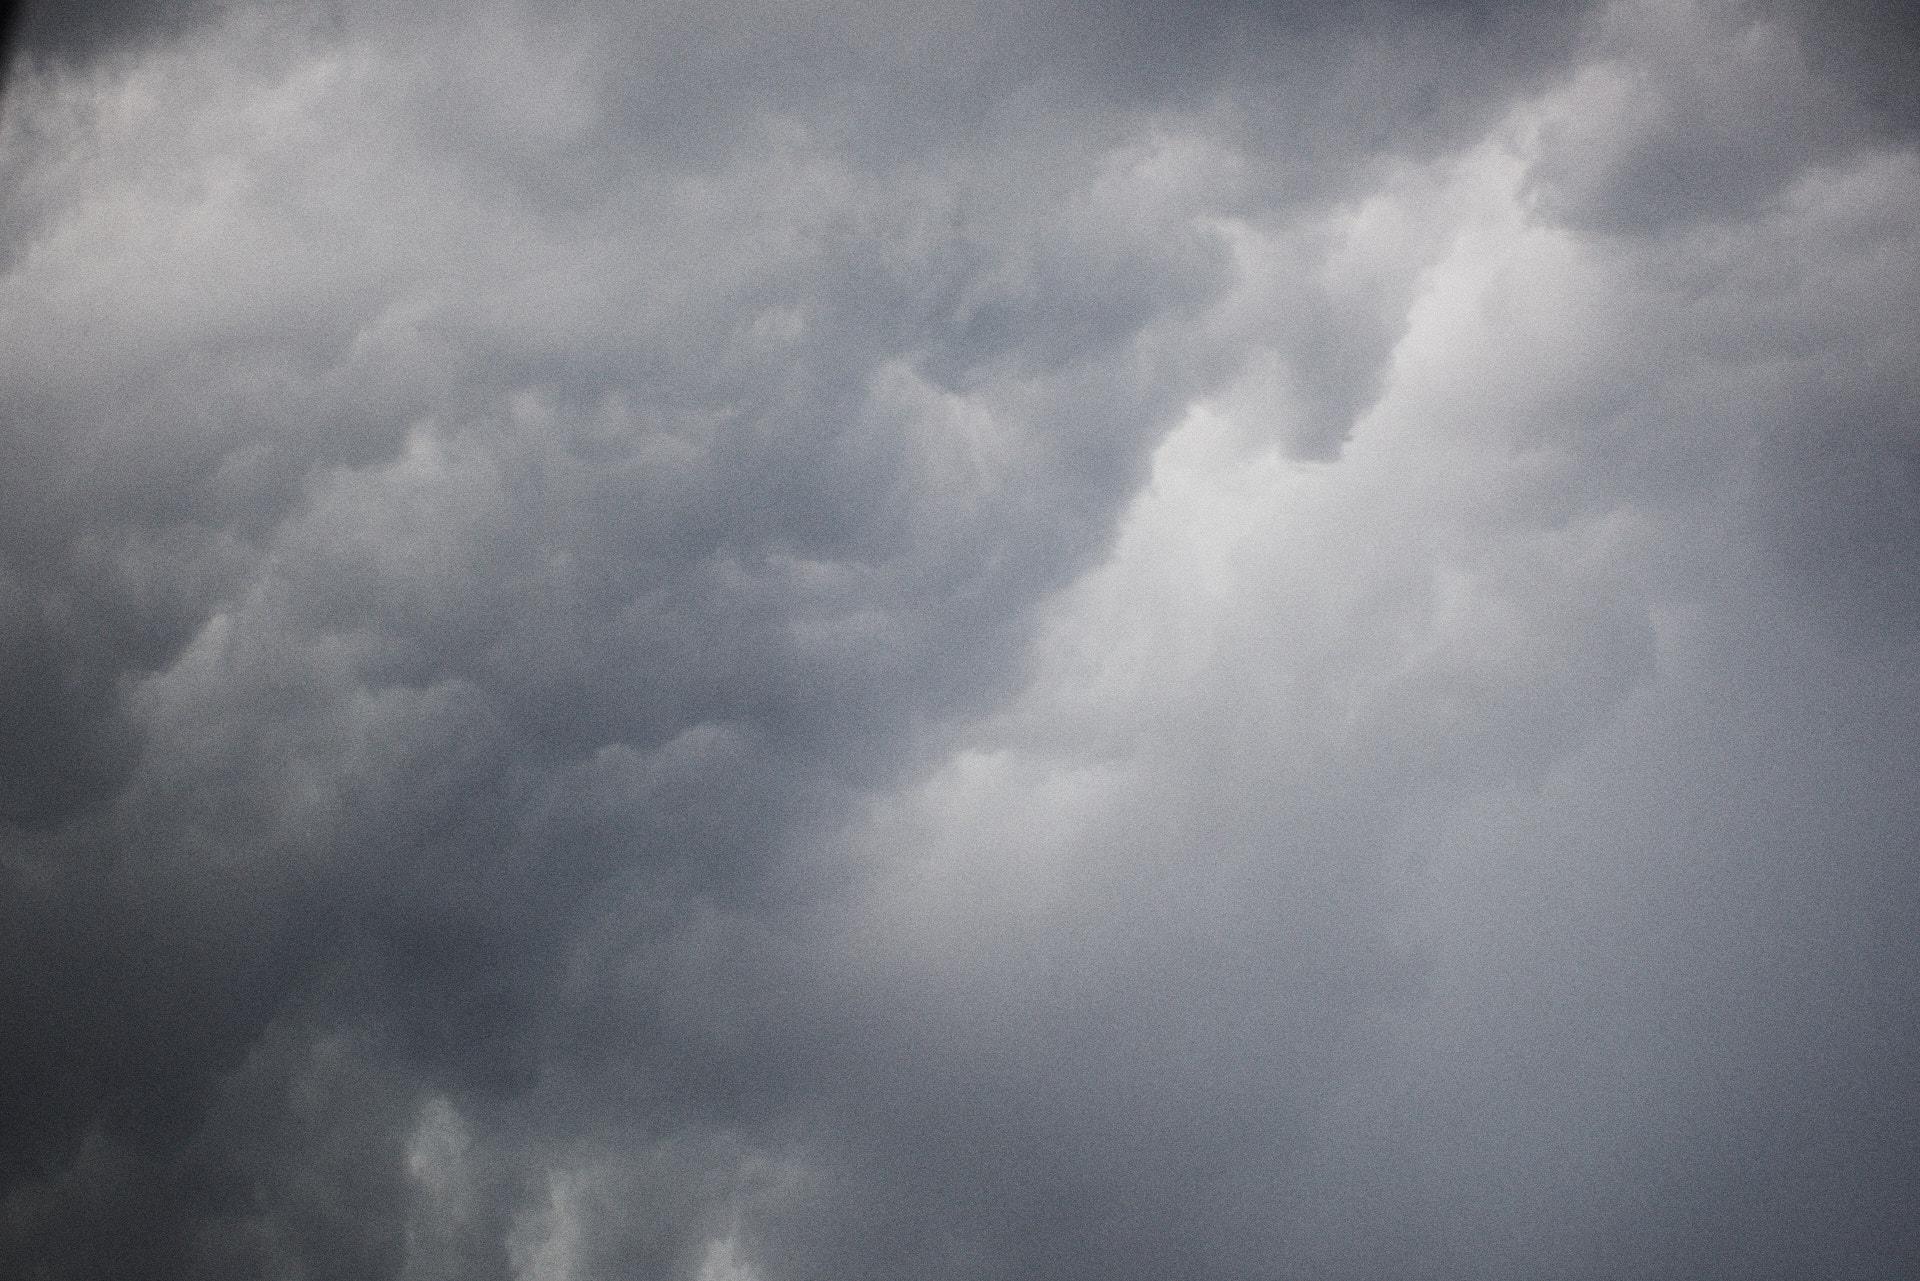 June 26th, 2020 – Heavy rain